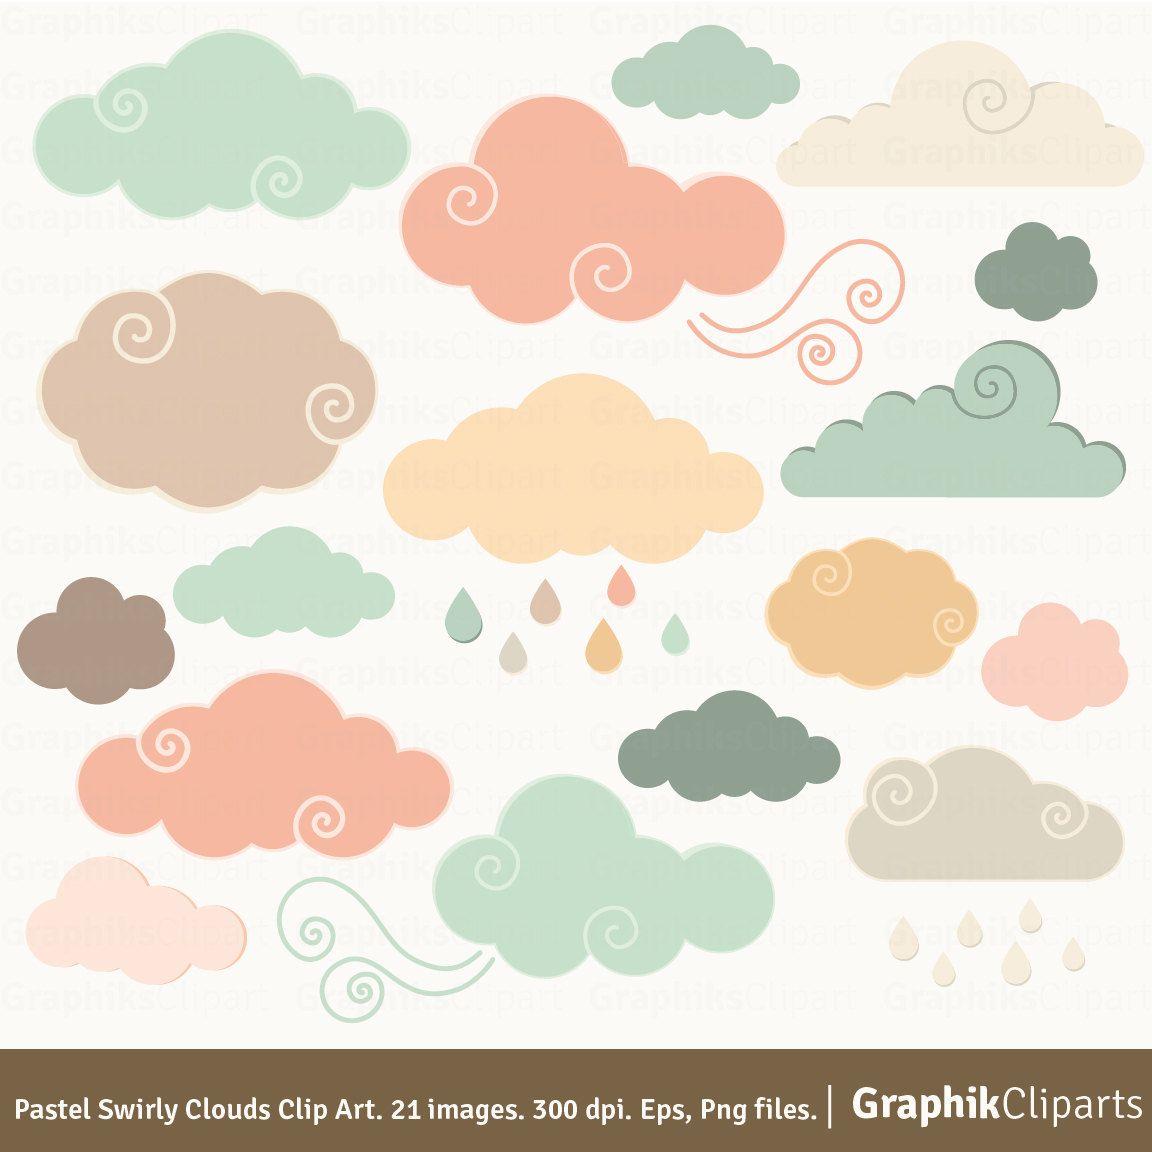 Pastel Swirly Clouds Clip Art.